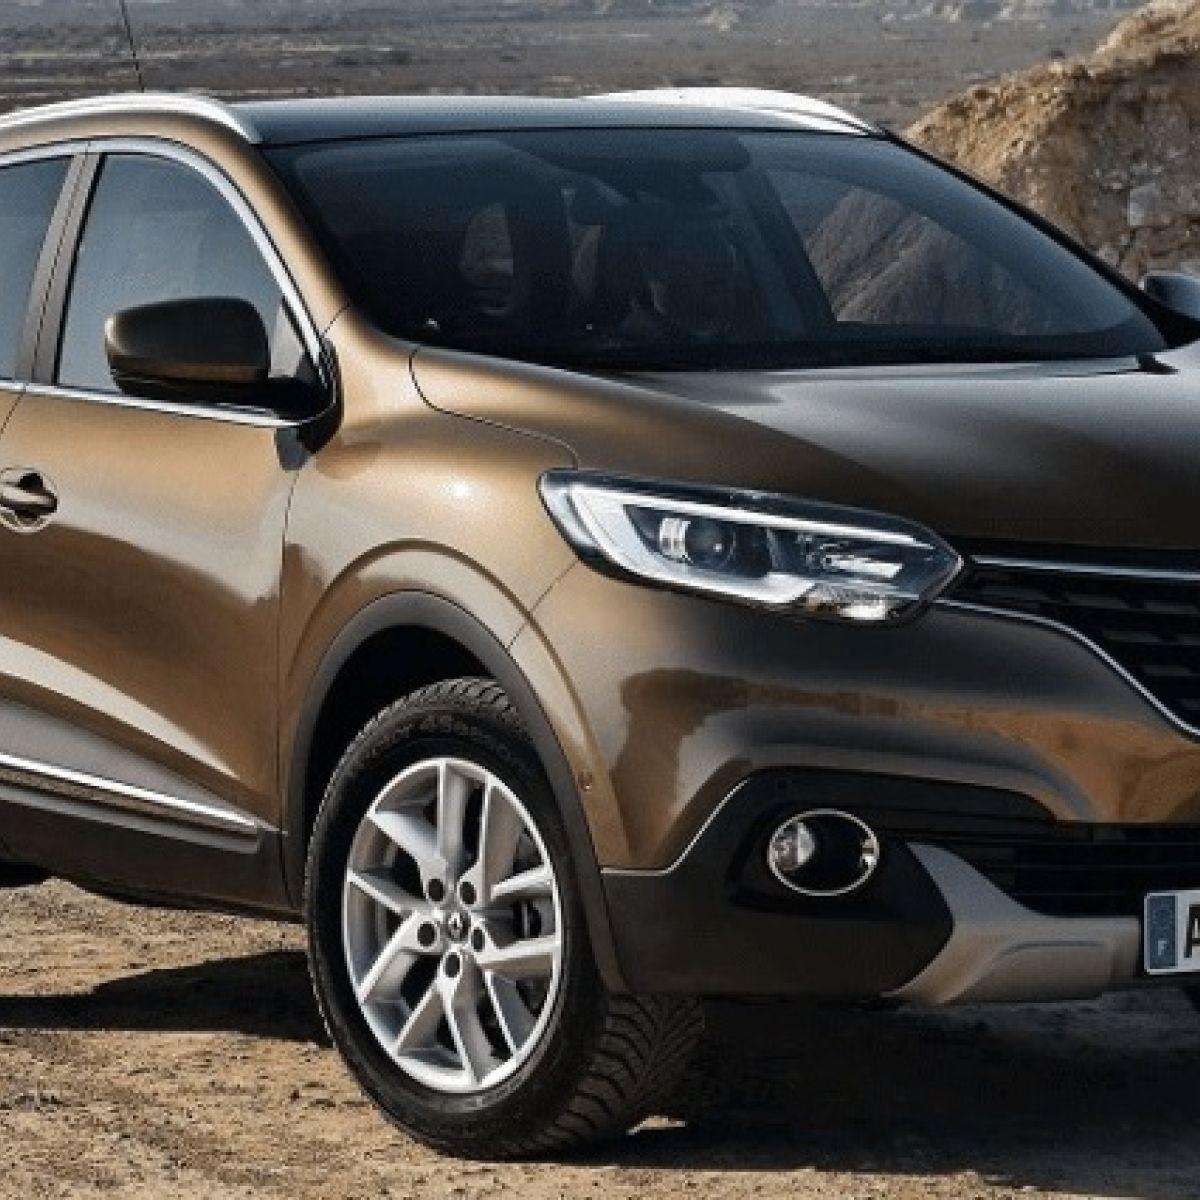 76: Renault Kadjar – Smart exterior styling let down by dull interior